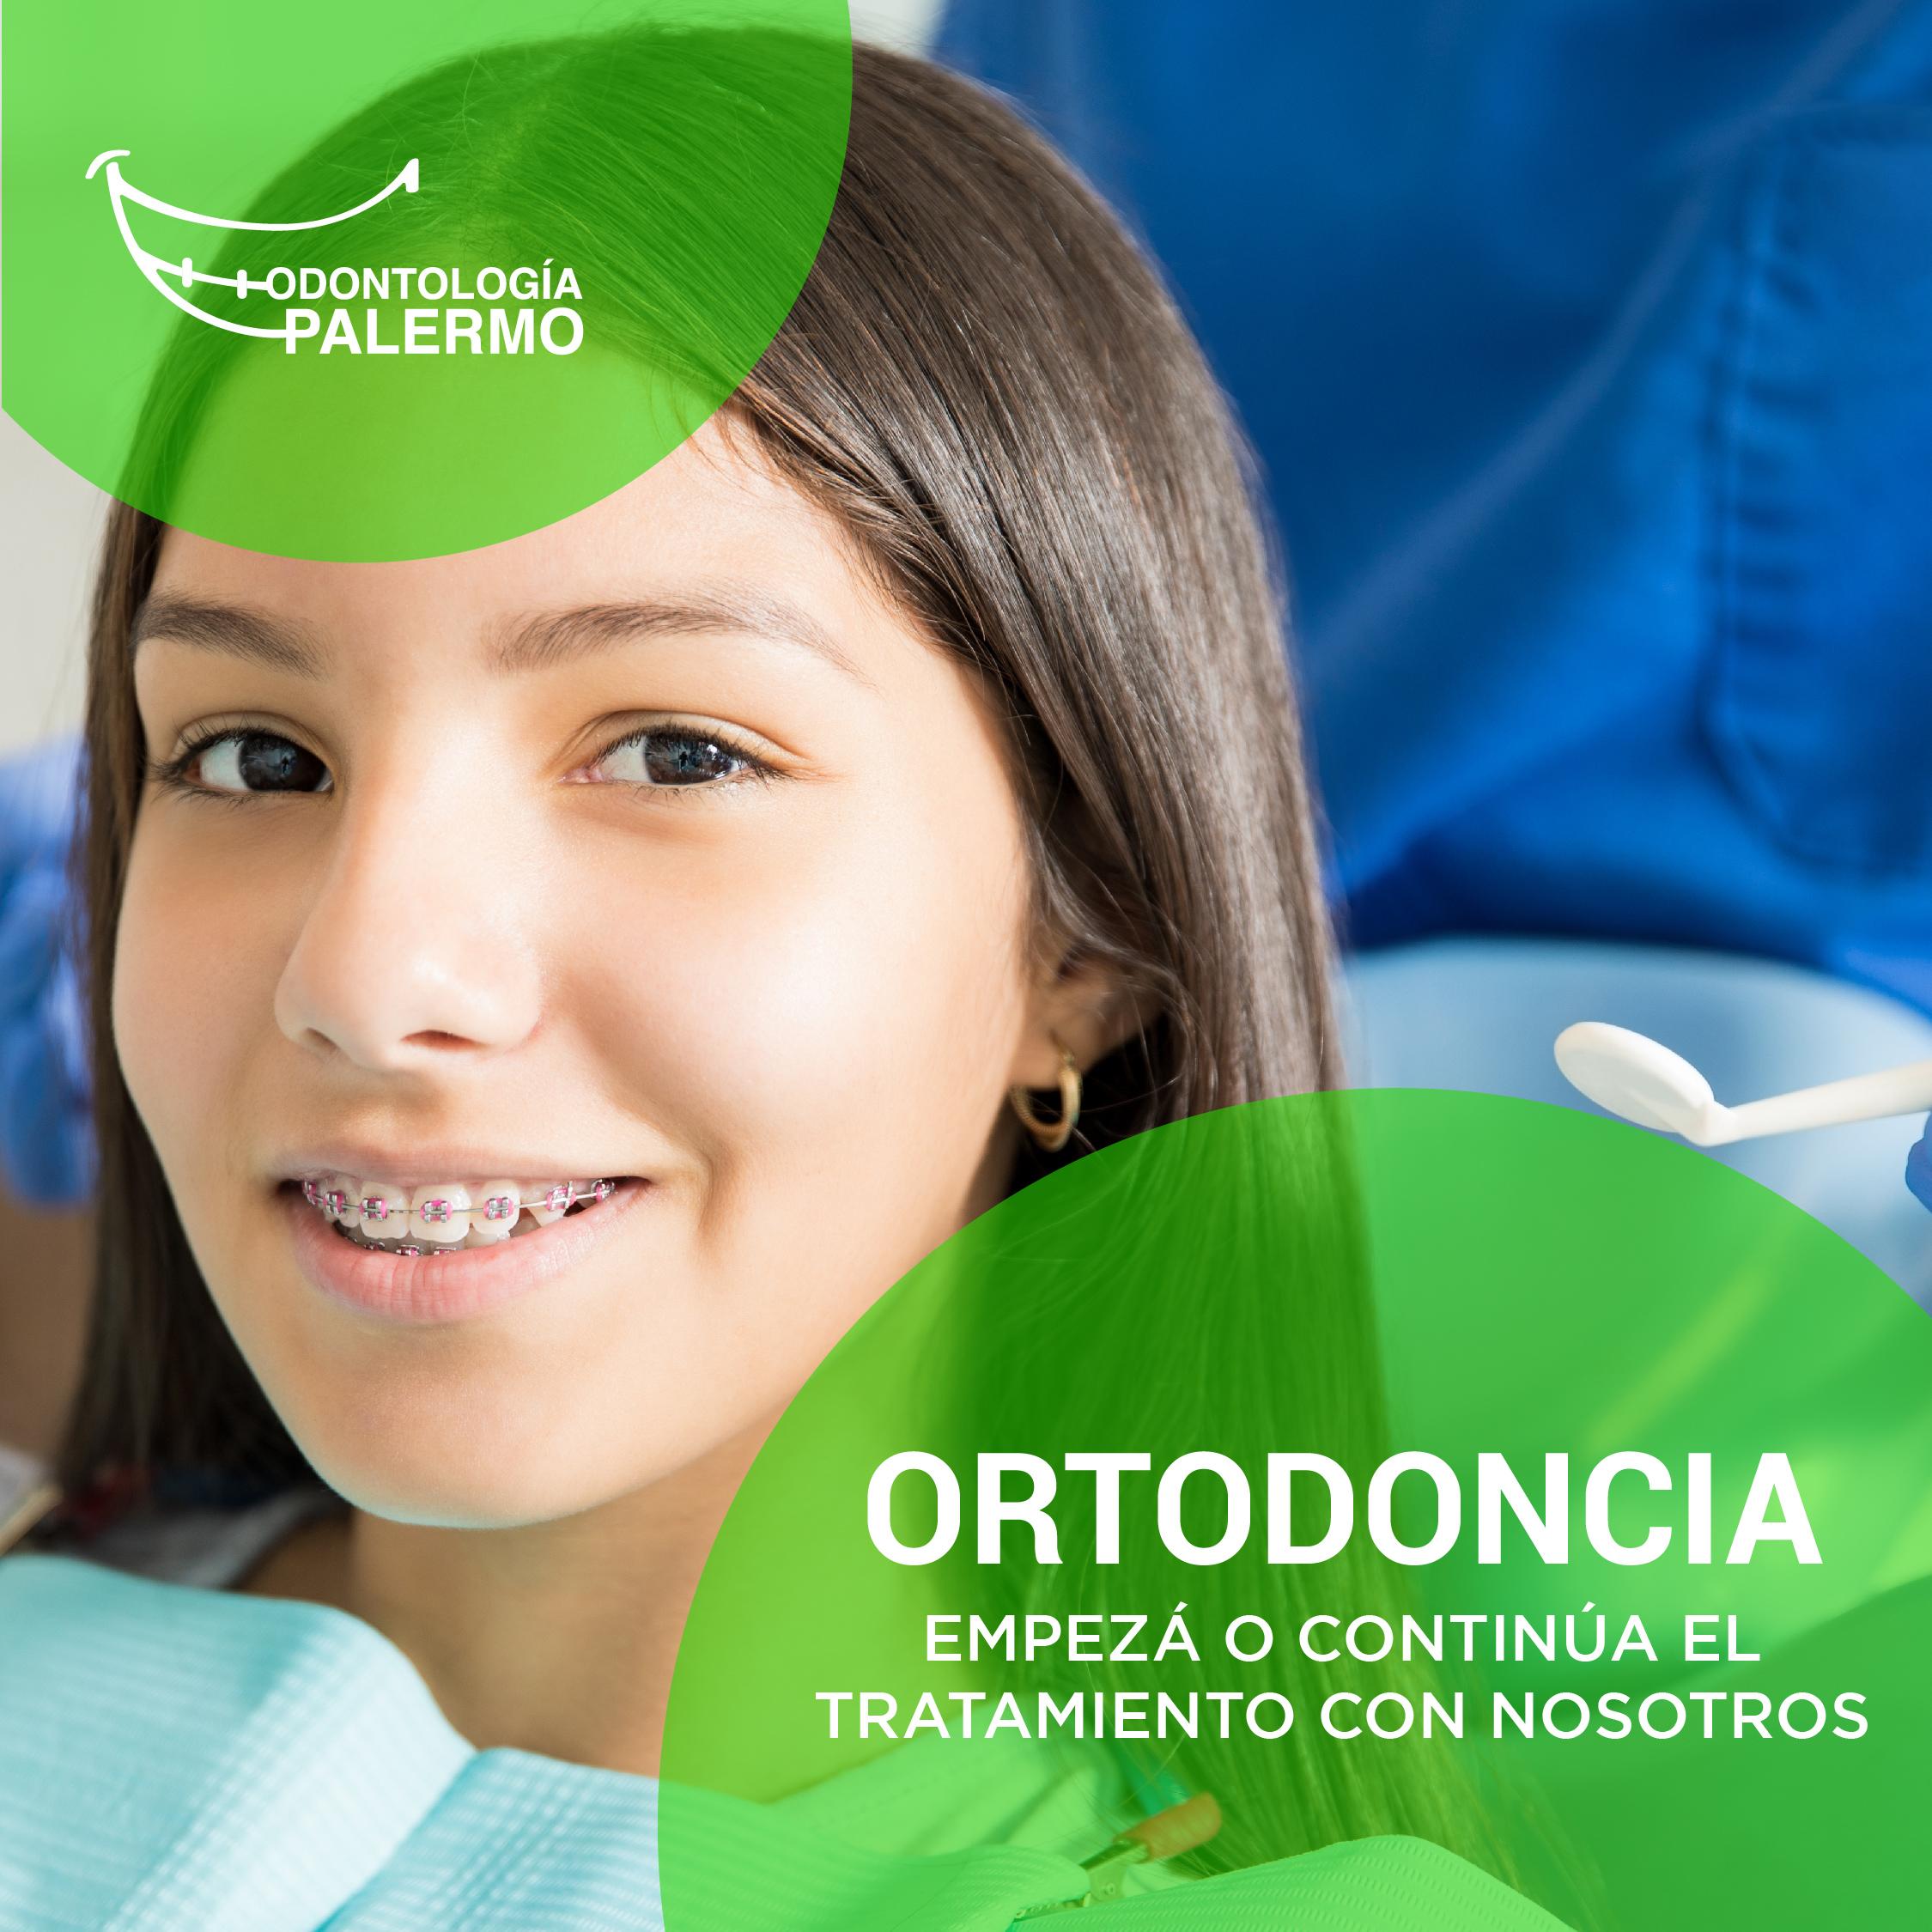 Brackets, Ortodoncia, Ortopedia